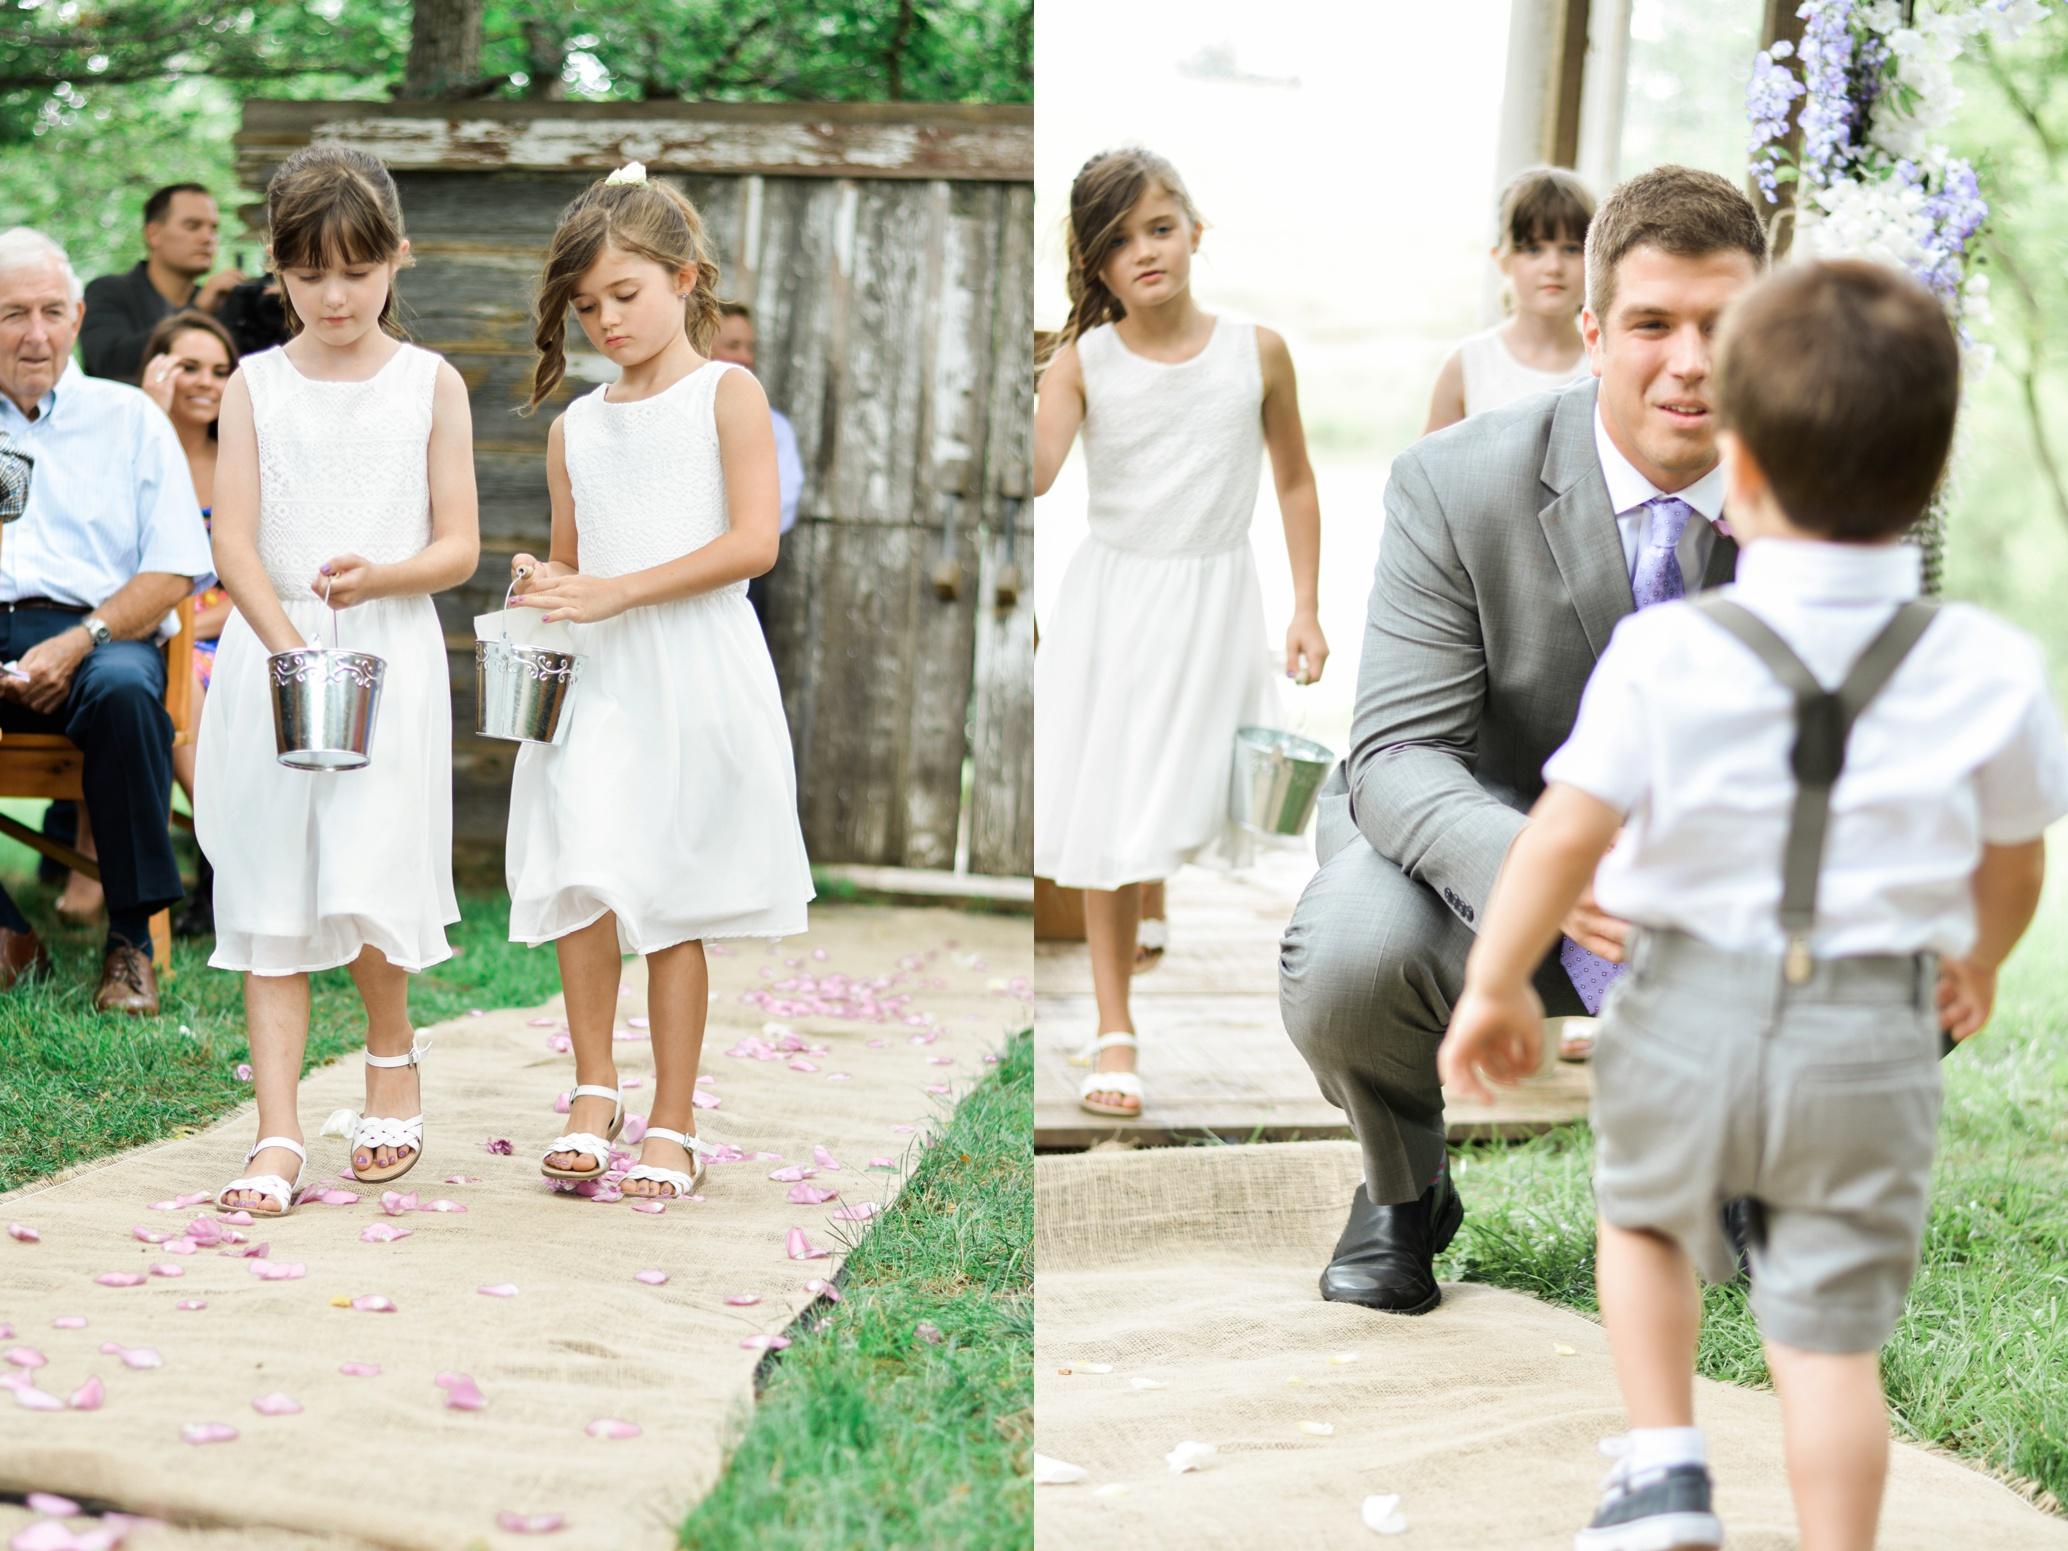 Barnes' Place Rustic Outdoor Wedding | Ali Leigh Photo Minneapolis Wedding Photographer_0109.jpg